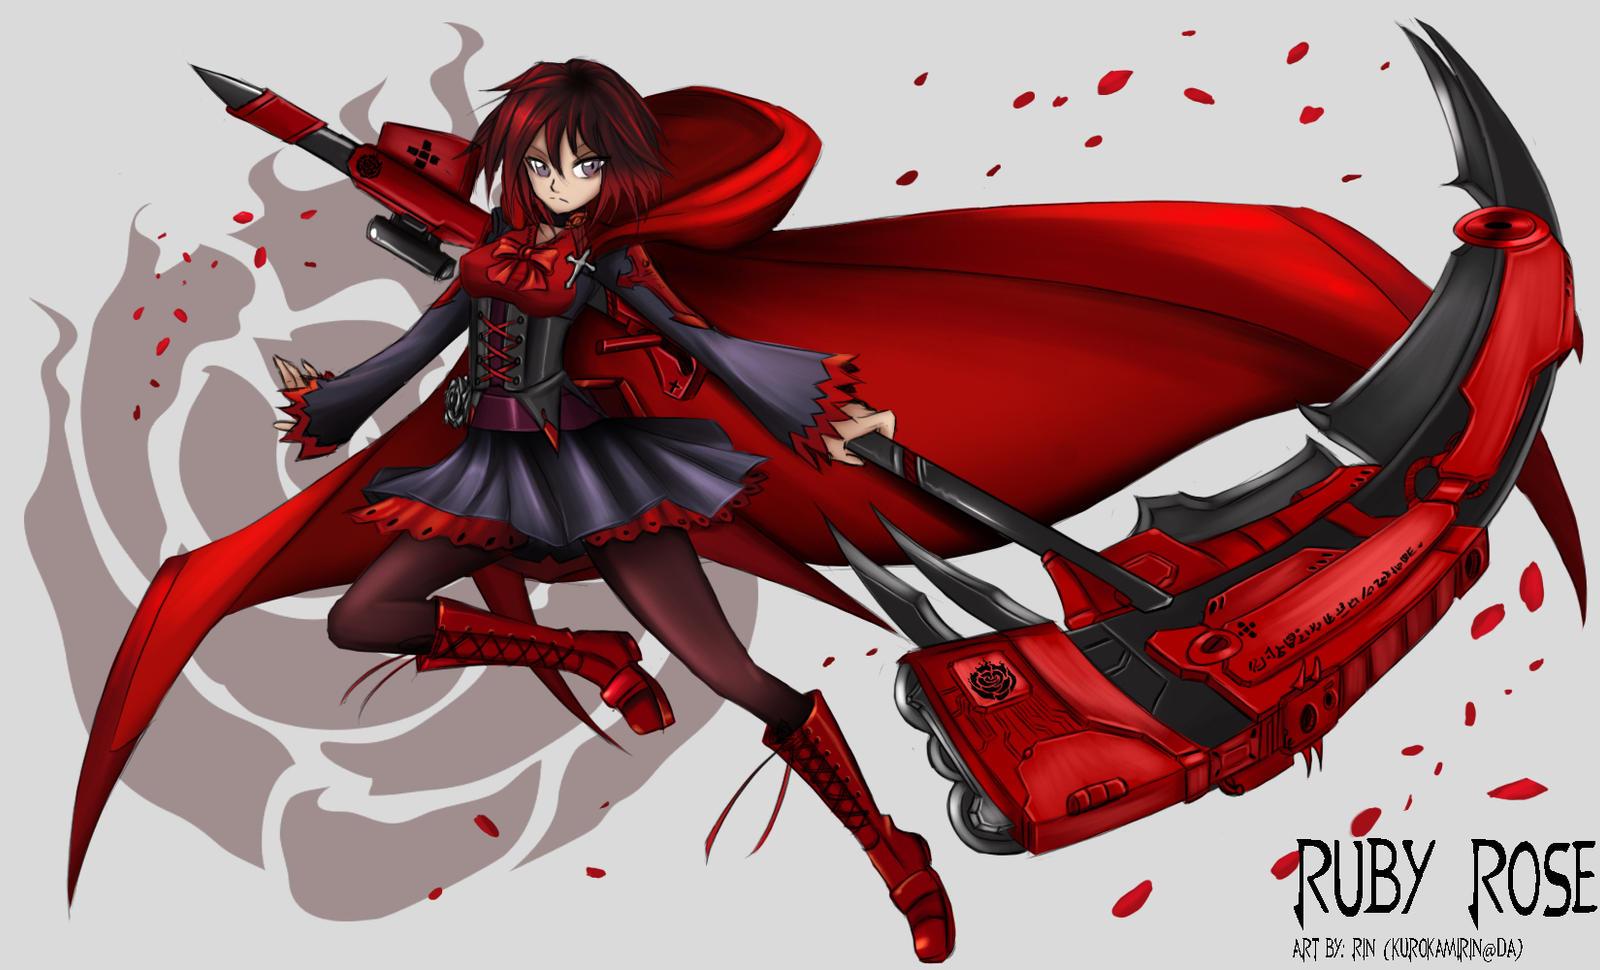 Rwby ruby rose by kurokamirin on deviantart - Rwby deviantart ...